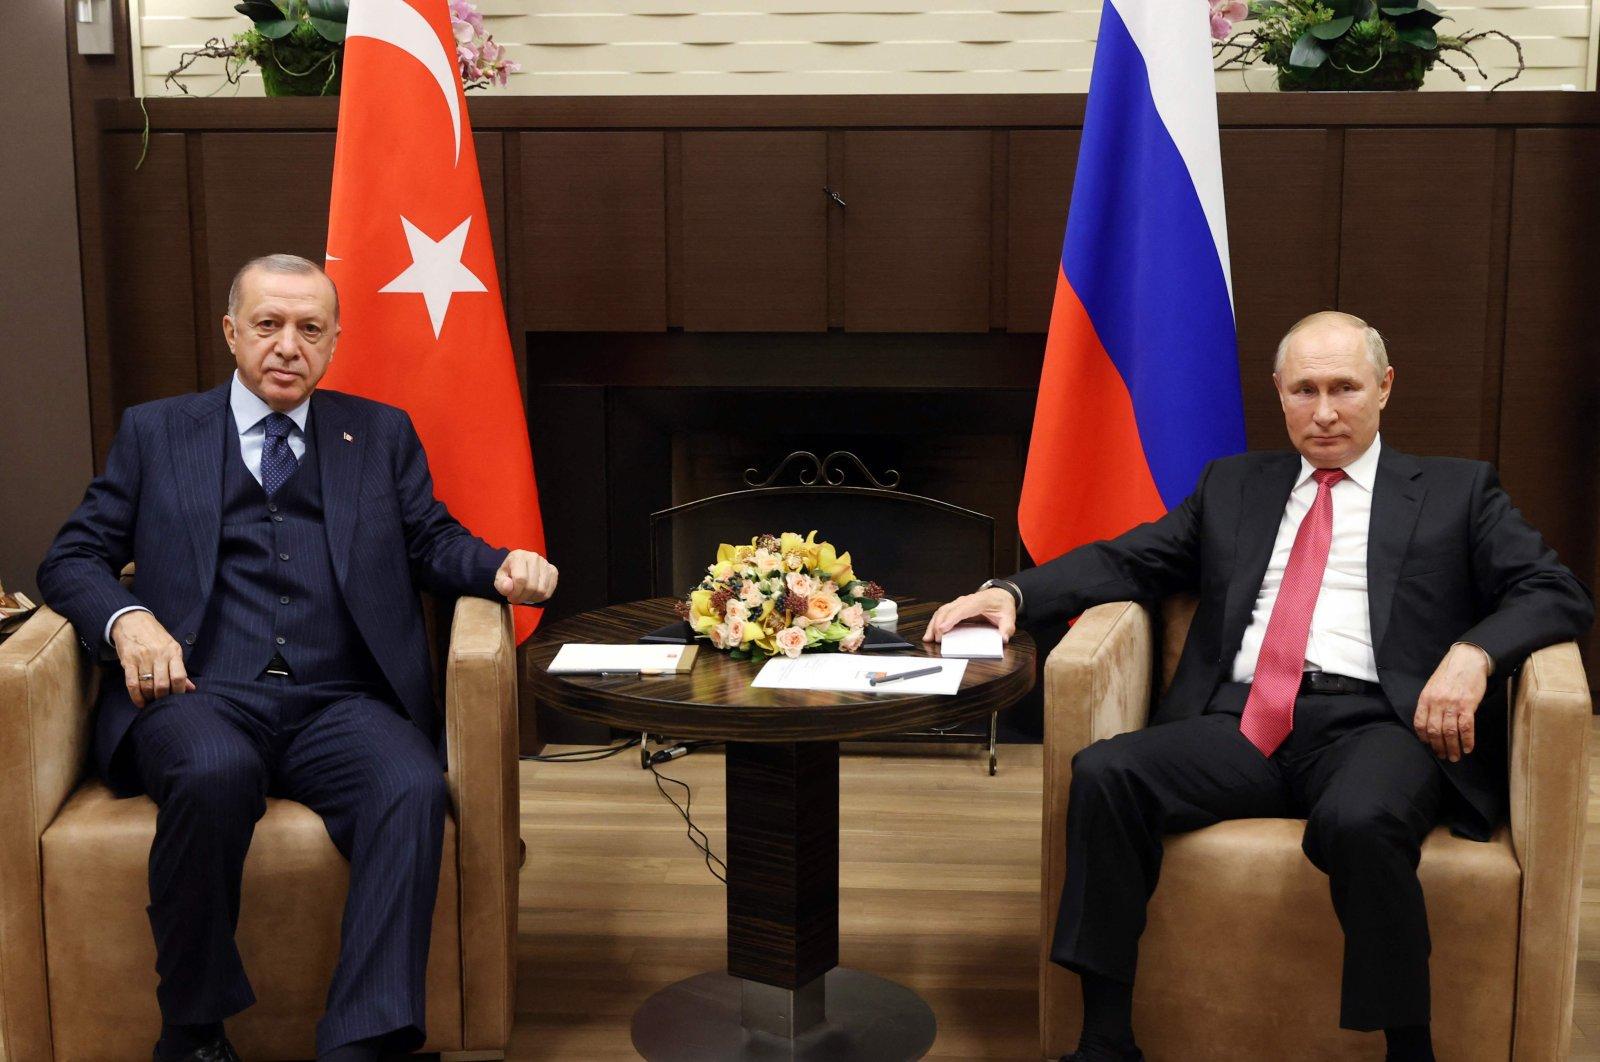 Turkish President Recep Tayyip Erdoğan (L) and Russian President Vladimir Putin pose ahead of their meeting in Sochi, Russia, Sept. 29, 2021. (AFP Photo)